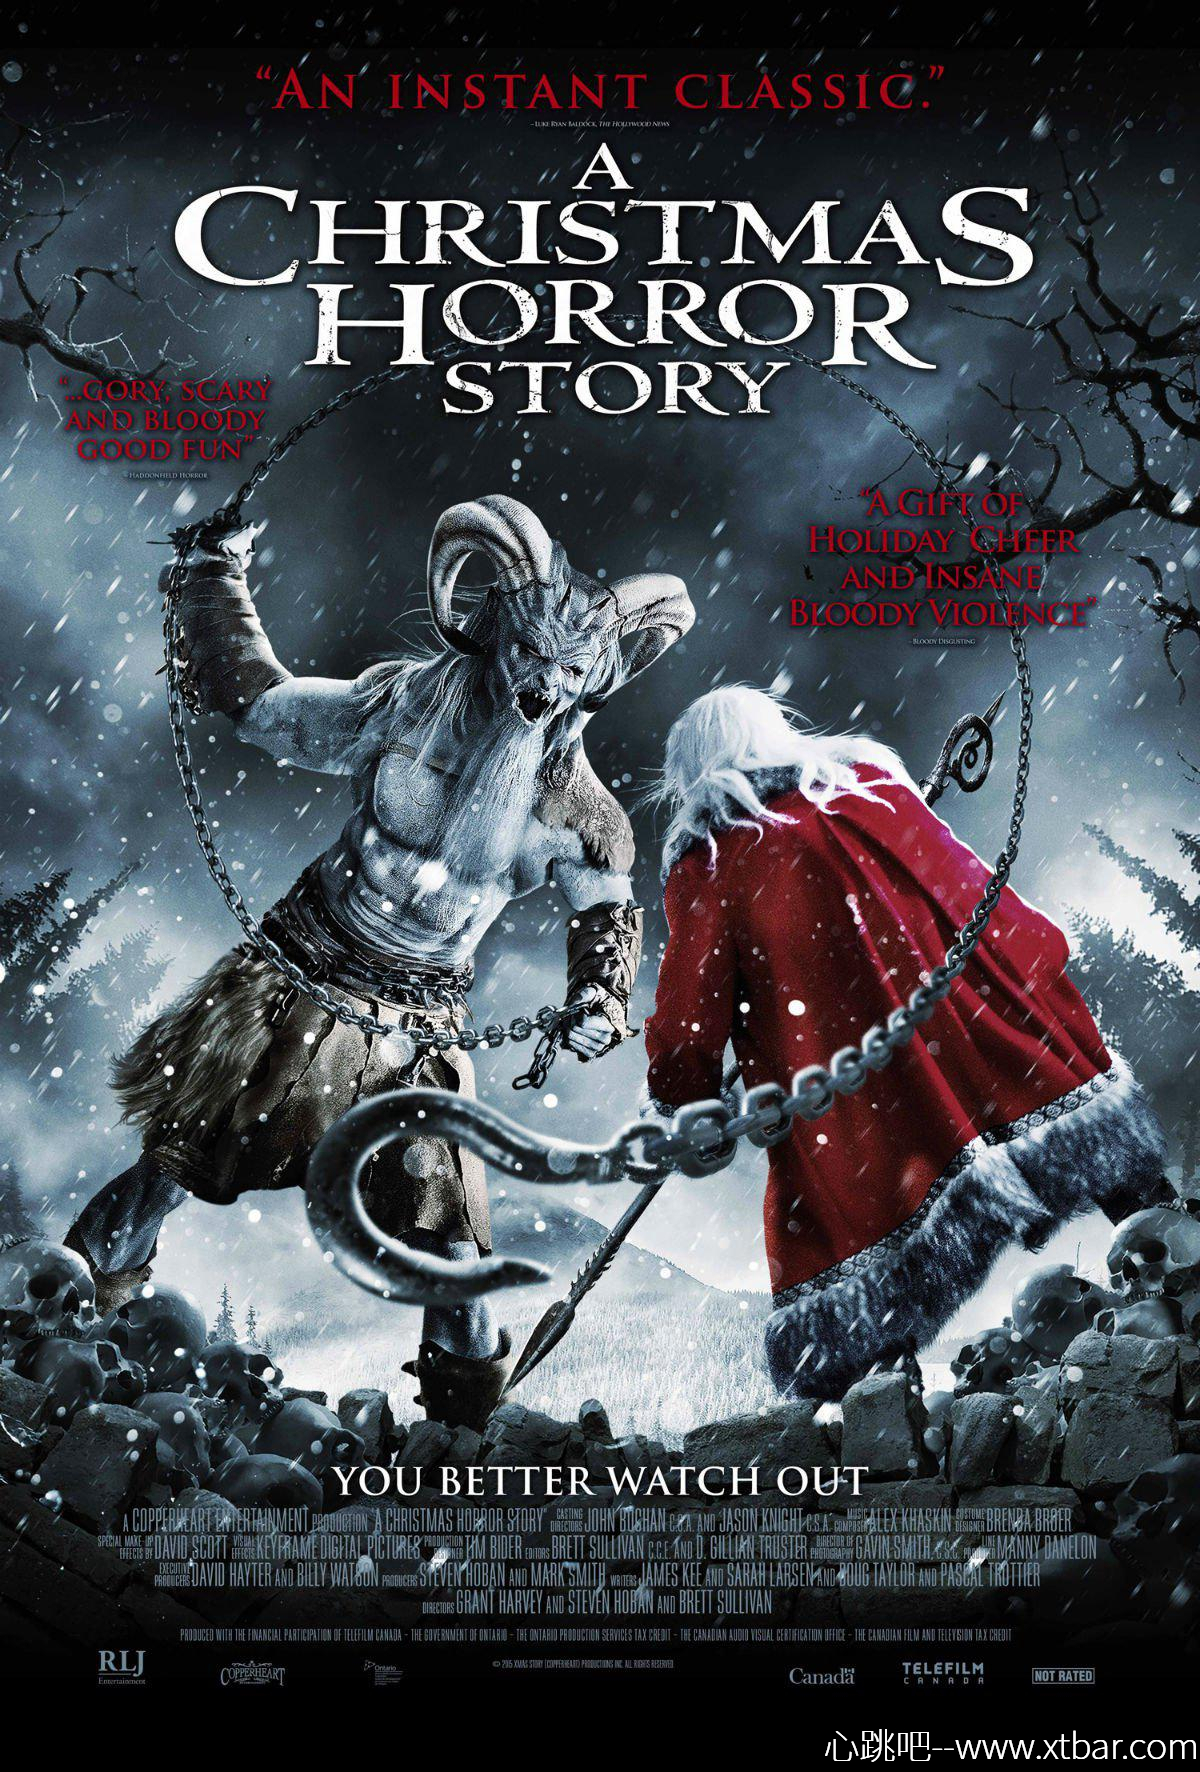 0085j6oIly1gltavqau8yj30xc1d8hdt - [心跳吧恐怖片推荐]:《圣诞节恐怖故事》,圣诞节我们来讲鬼故事!